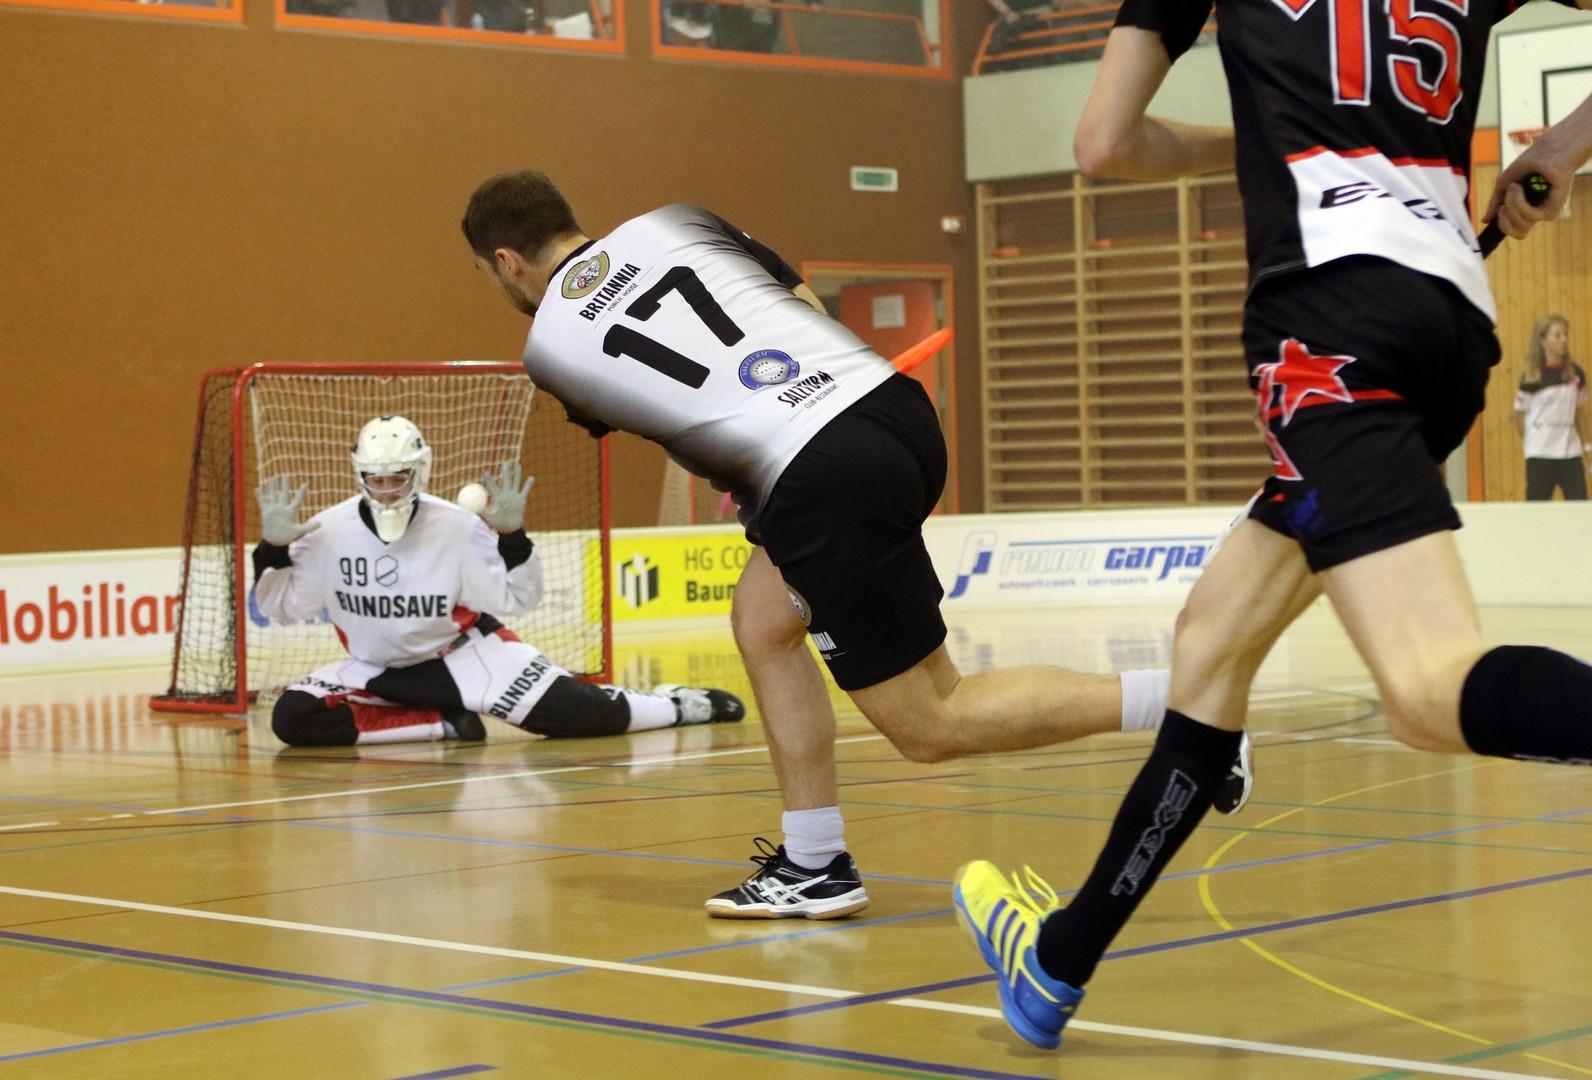 Unihockey Frutiger Marco Blacknosesheep.